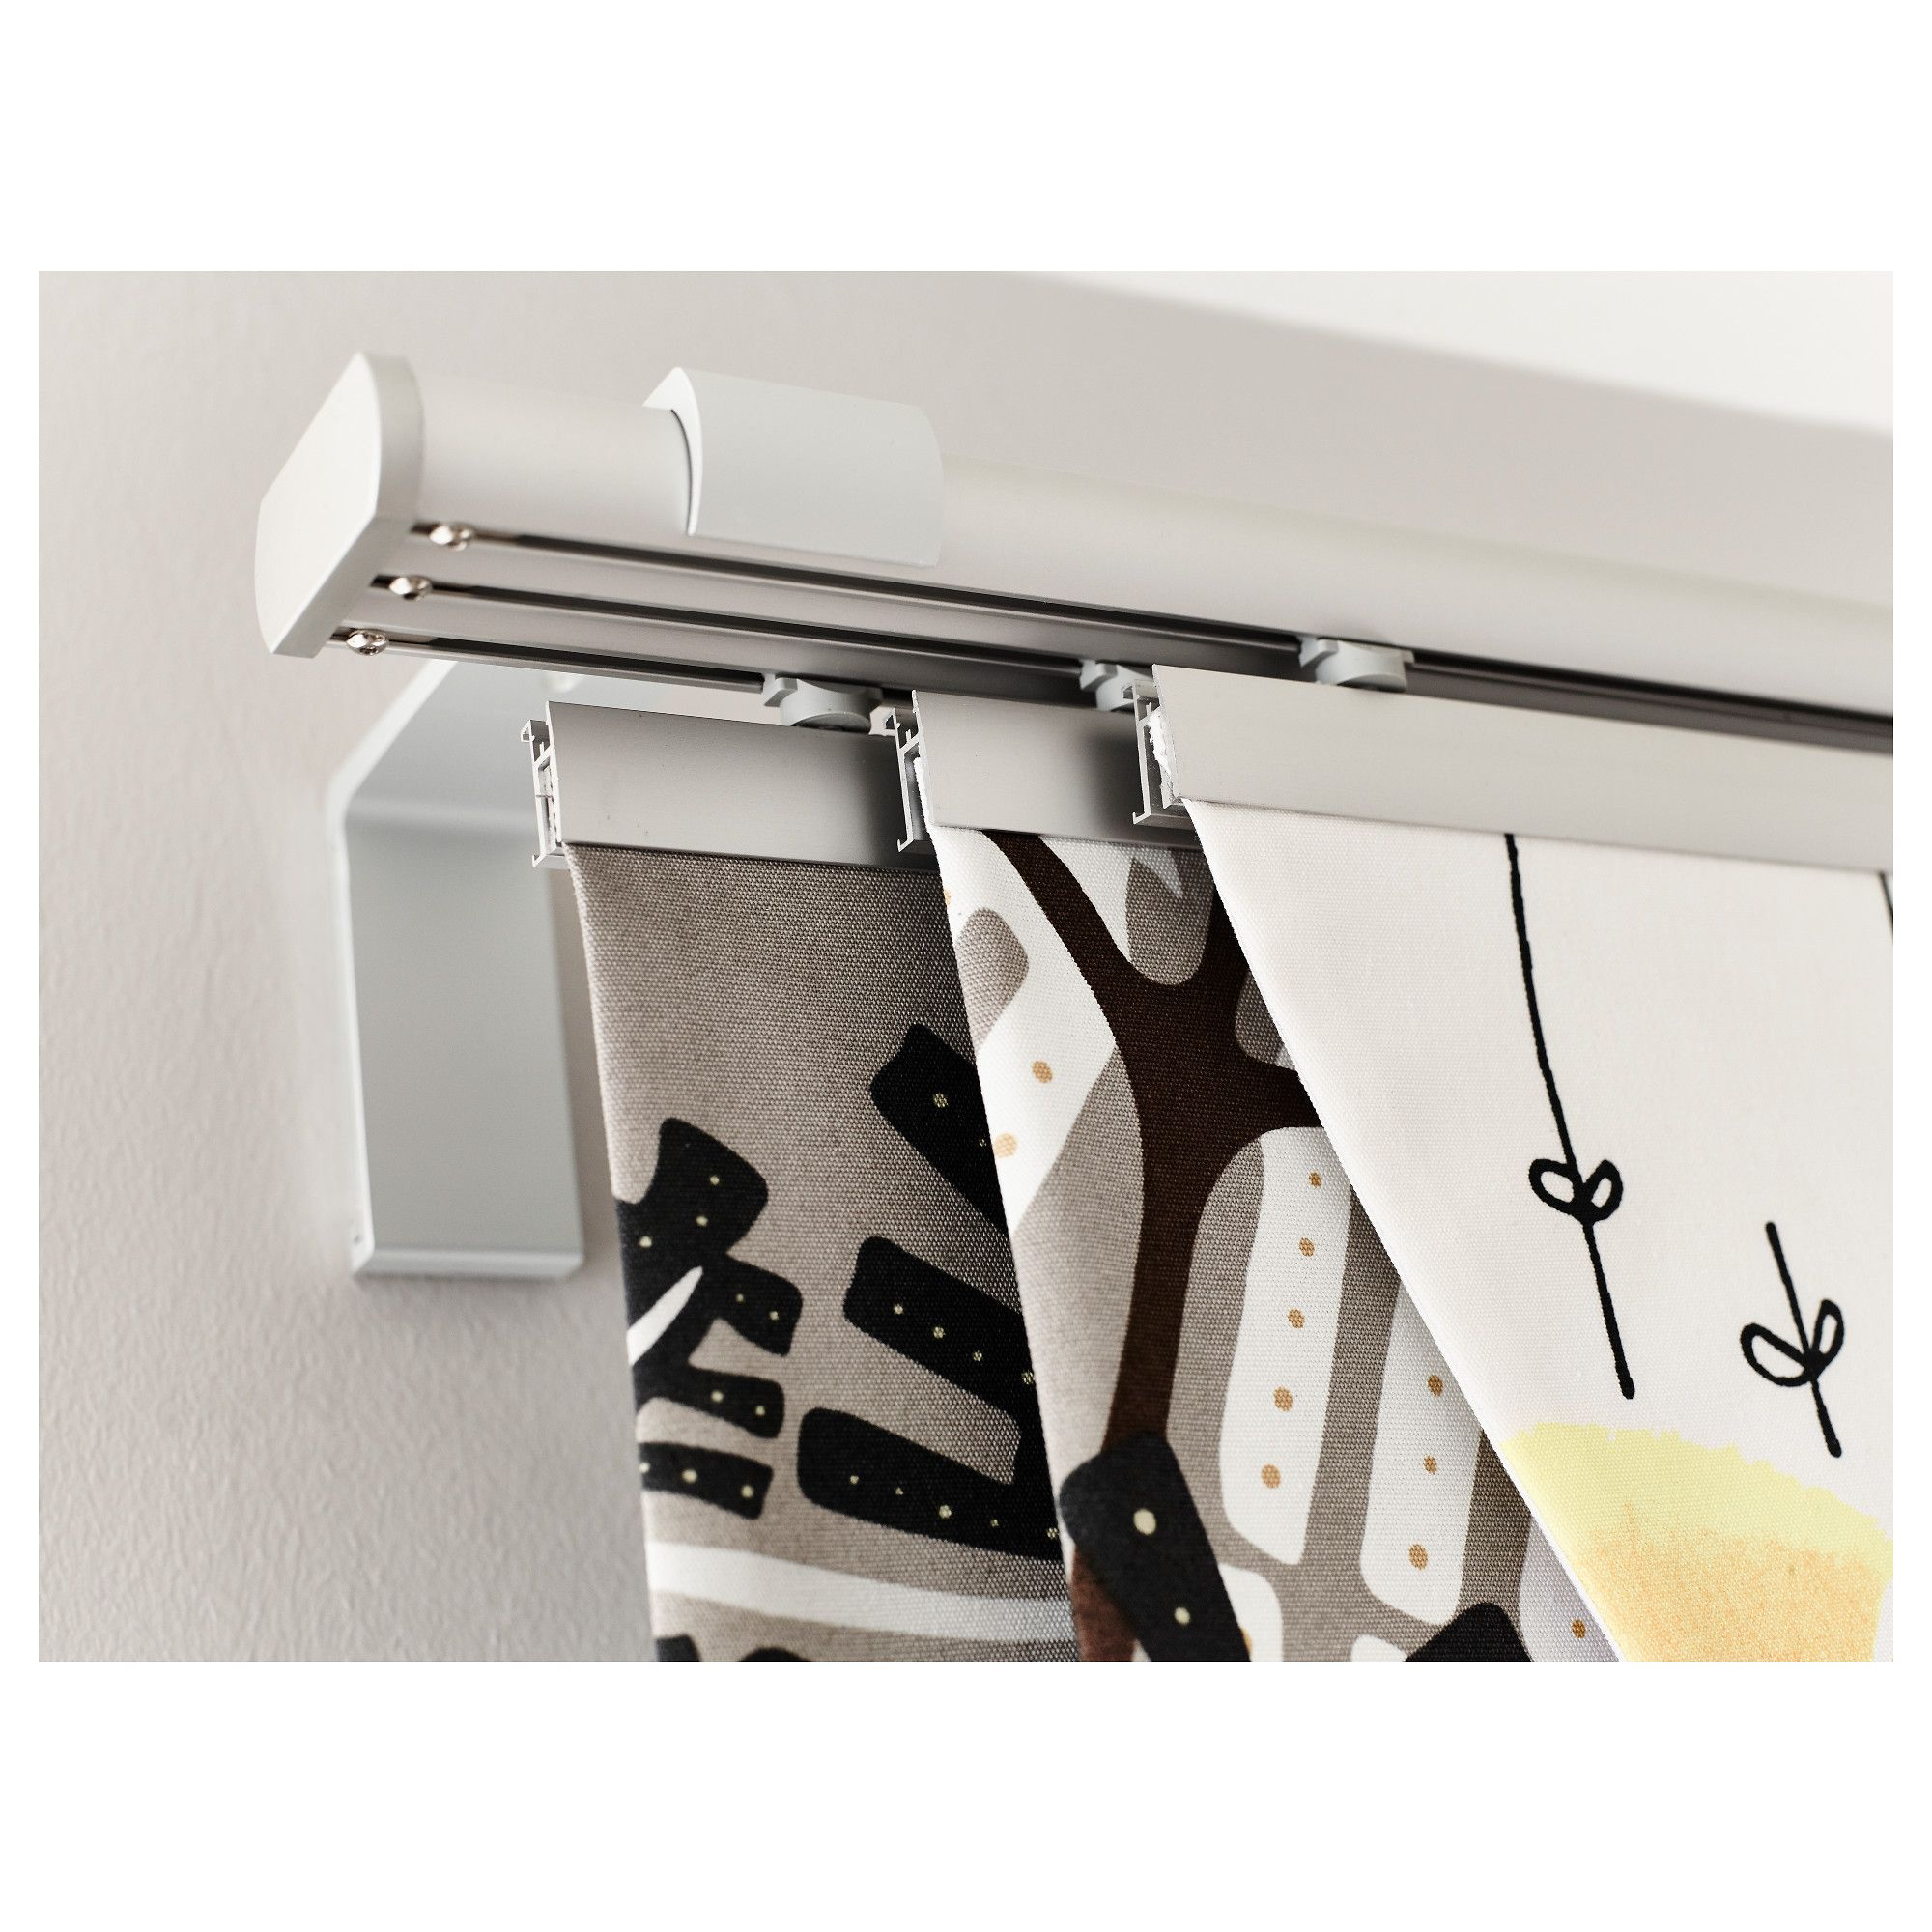 ikea - kvartal, triple curtain rail, you can use the included